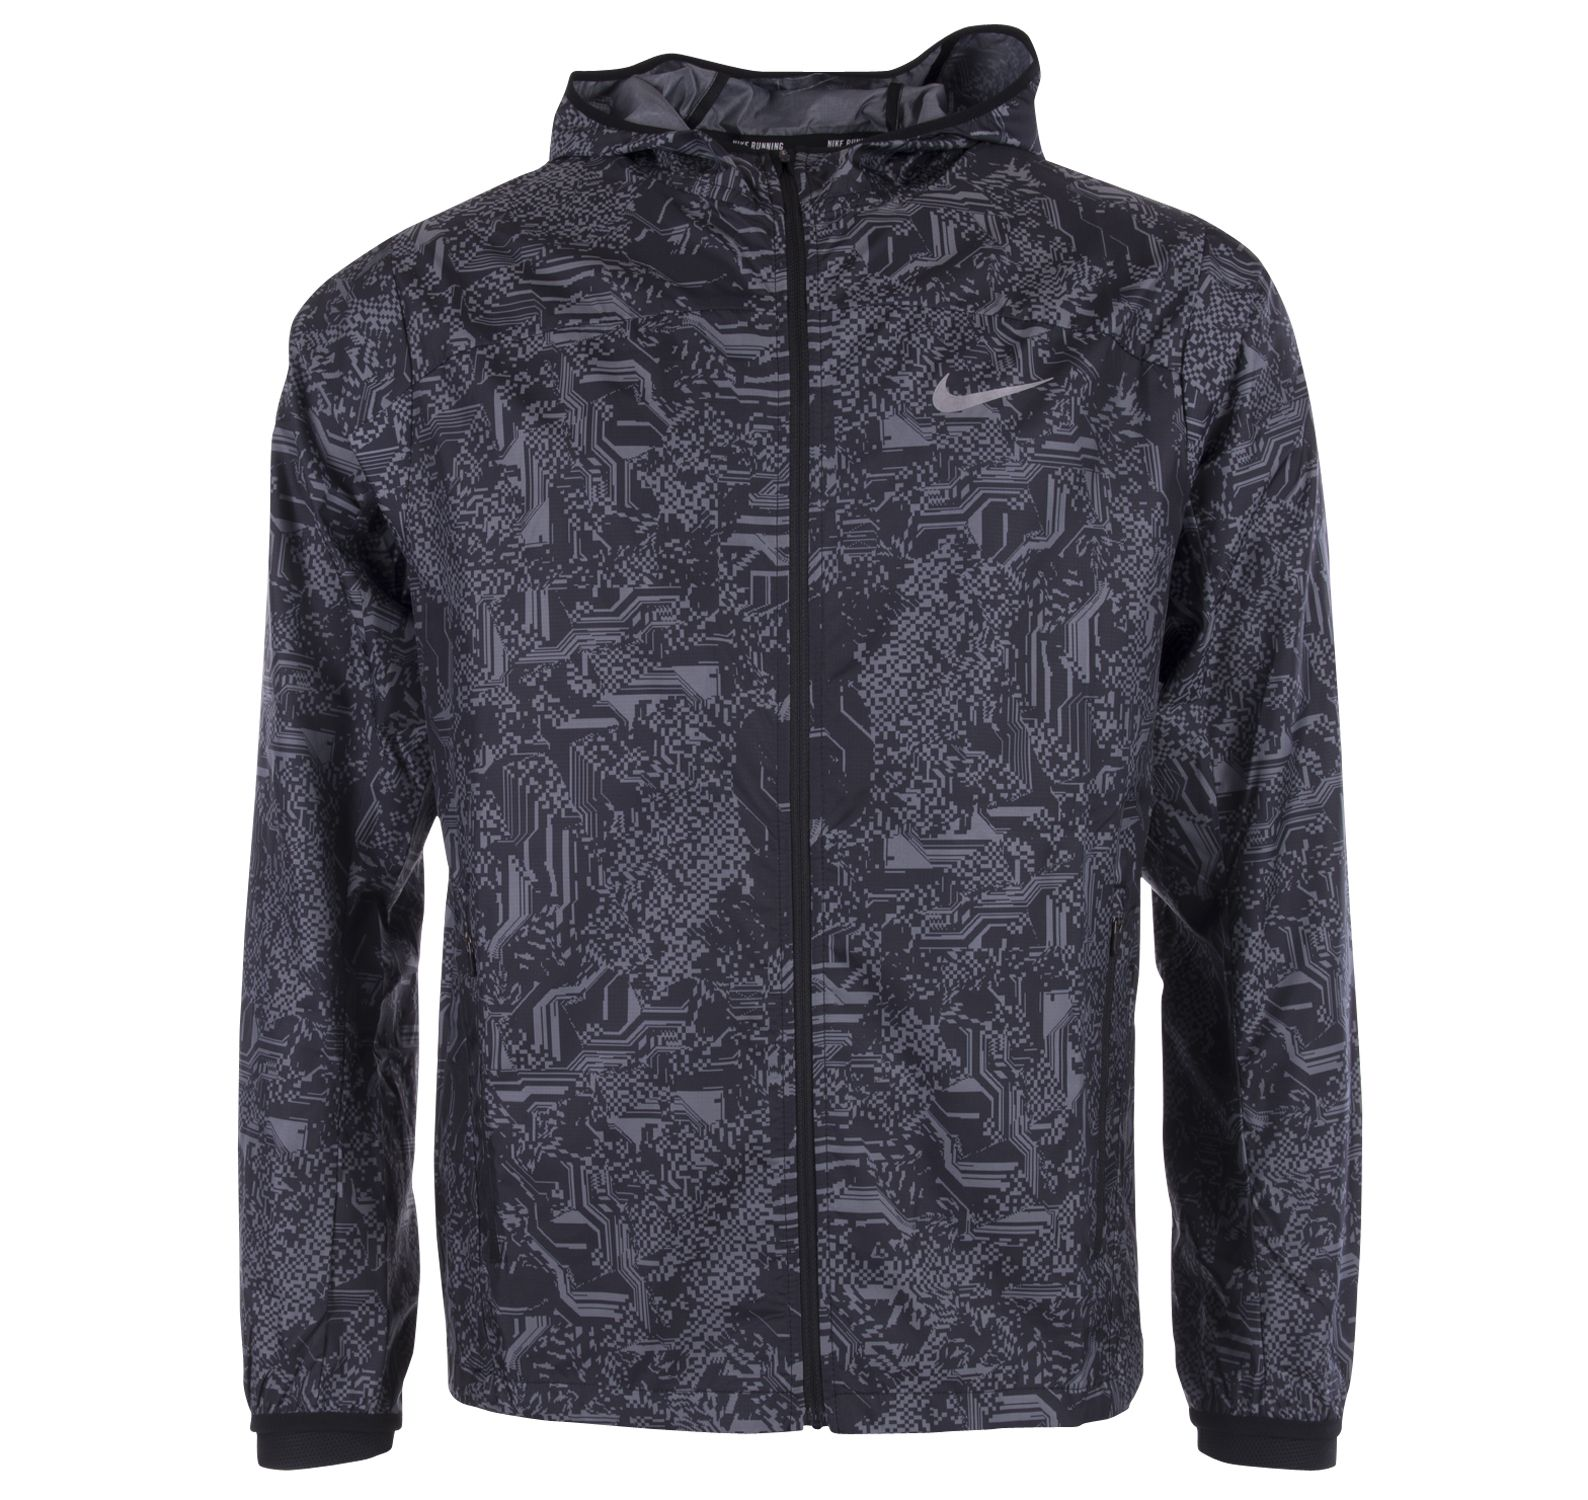 M Nk Shld Jkt Hd Racer Pr, Black/Cool Grey/Reflective Sil, Xxl,  T-Shirts